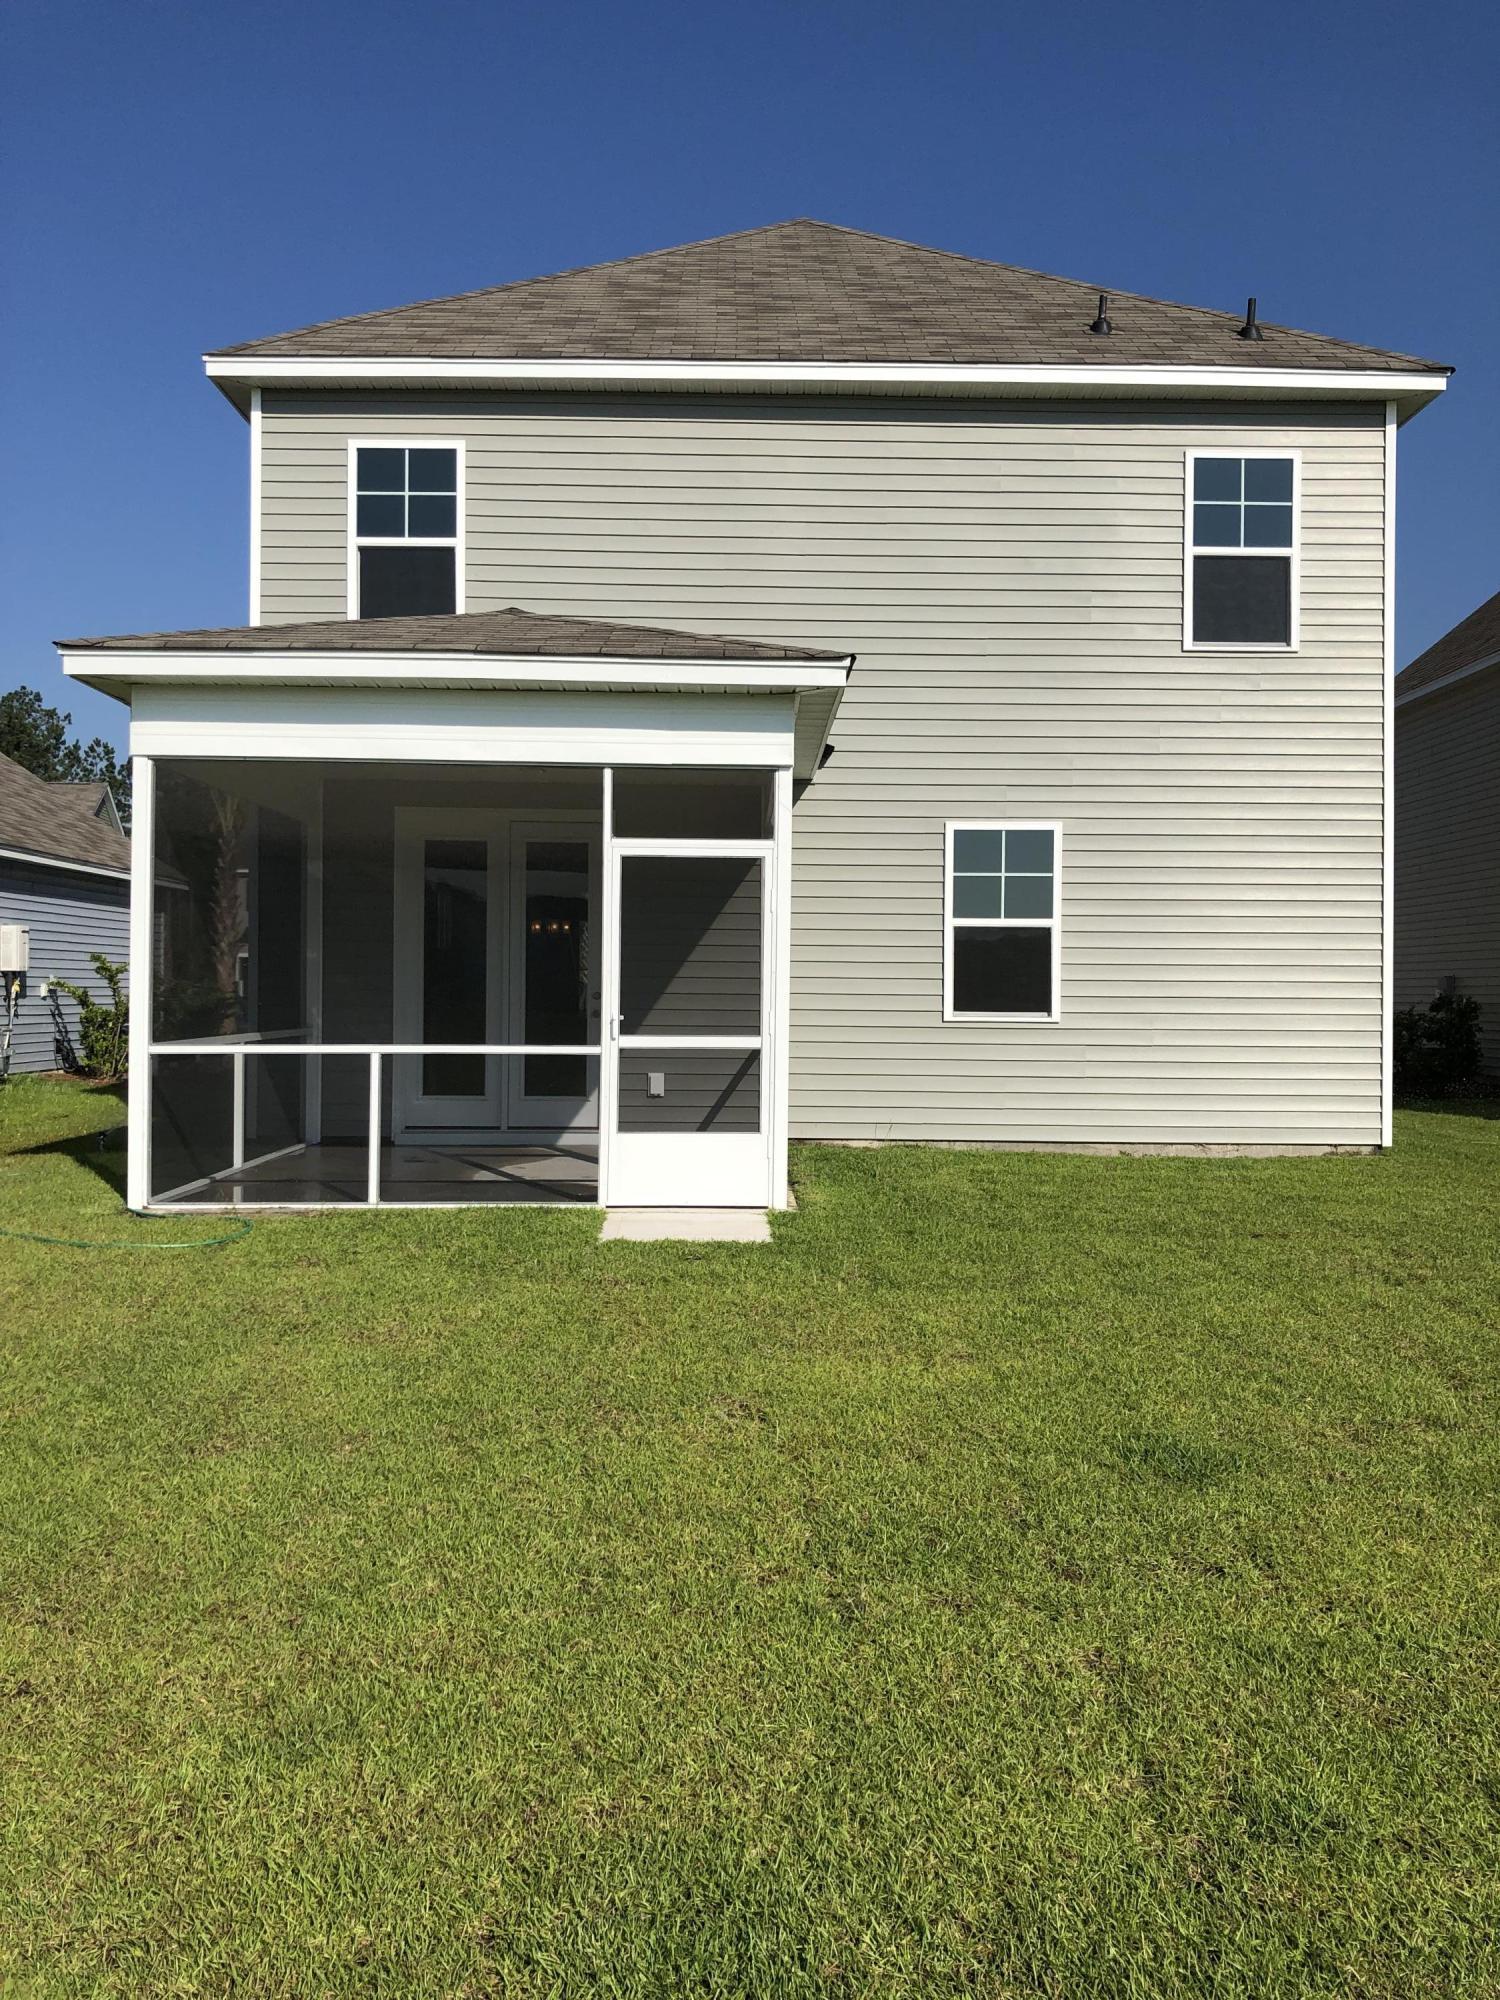 Cane Bay Plantation Homes For Sale - 454 Zenith, Summerville, SC - 14